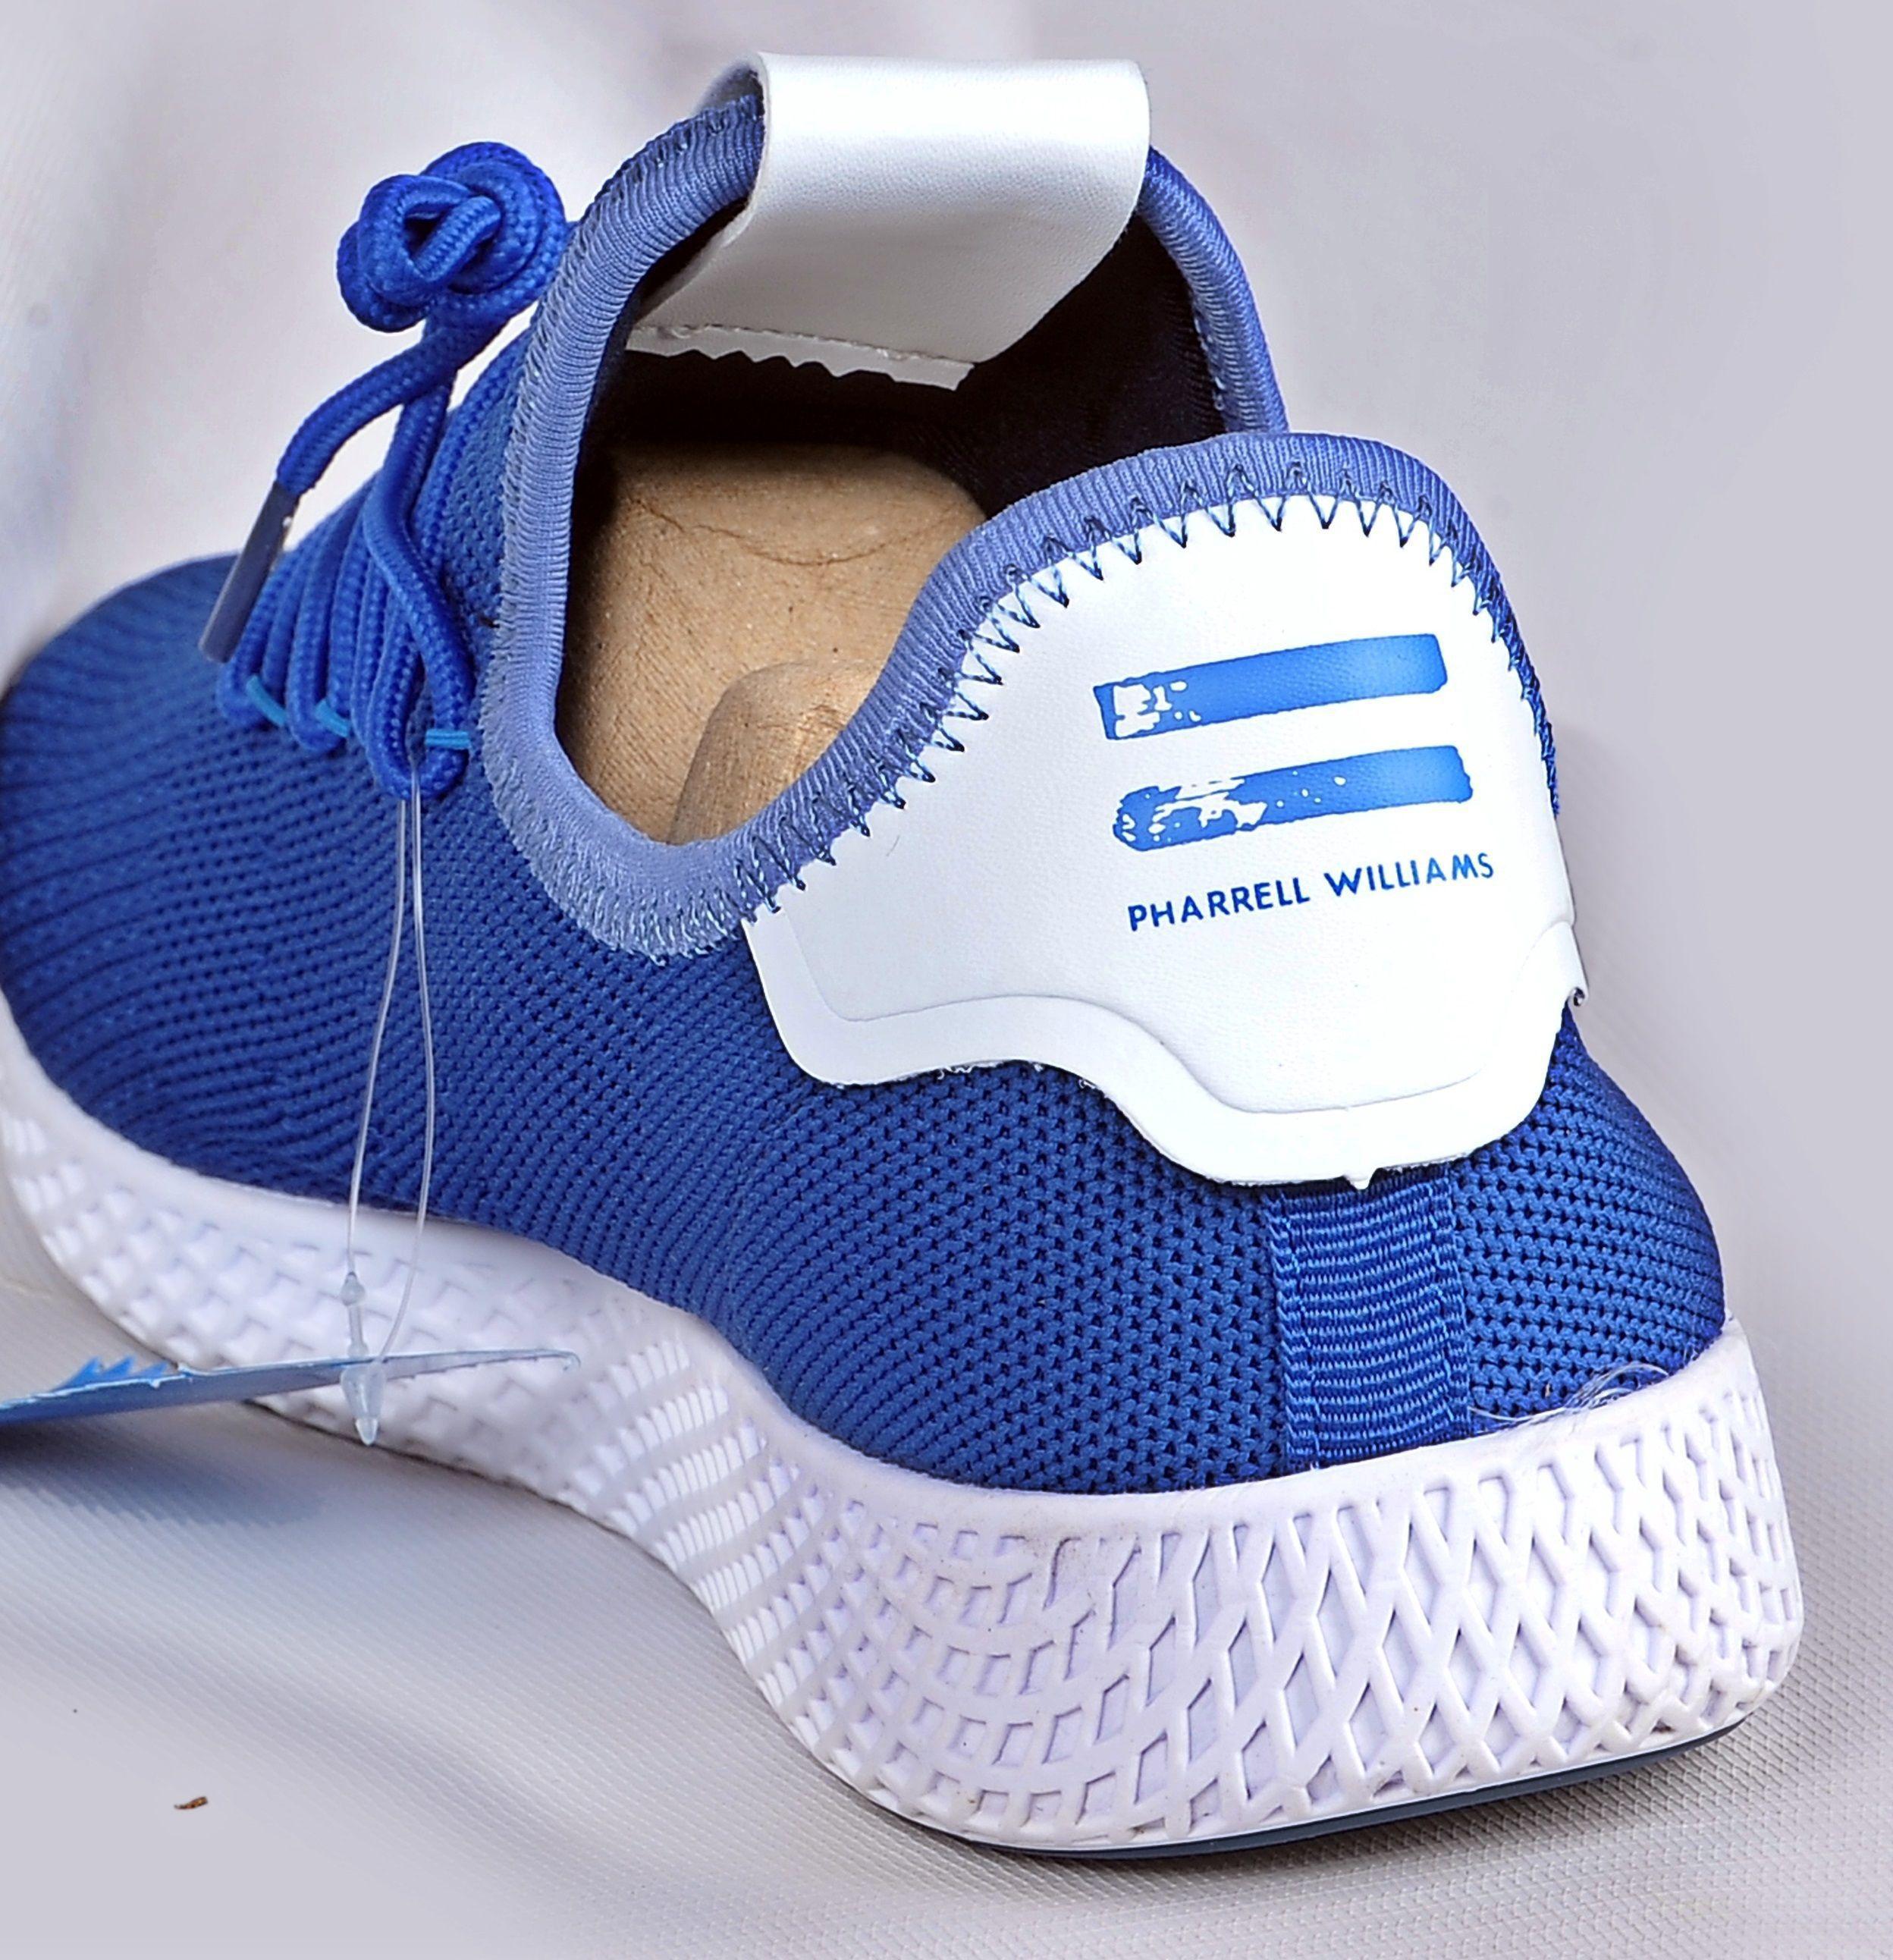 adidas pharrell williams running